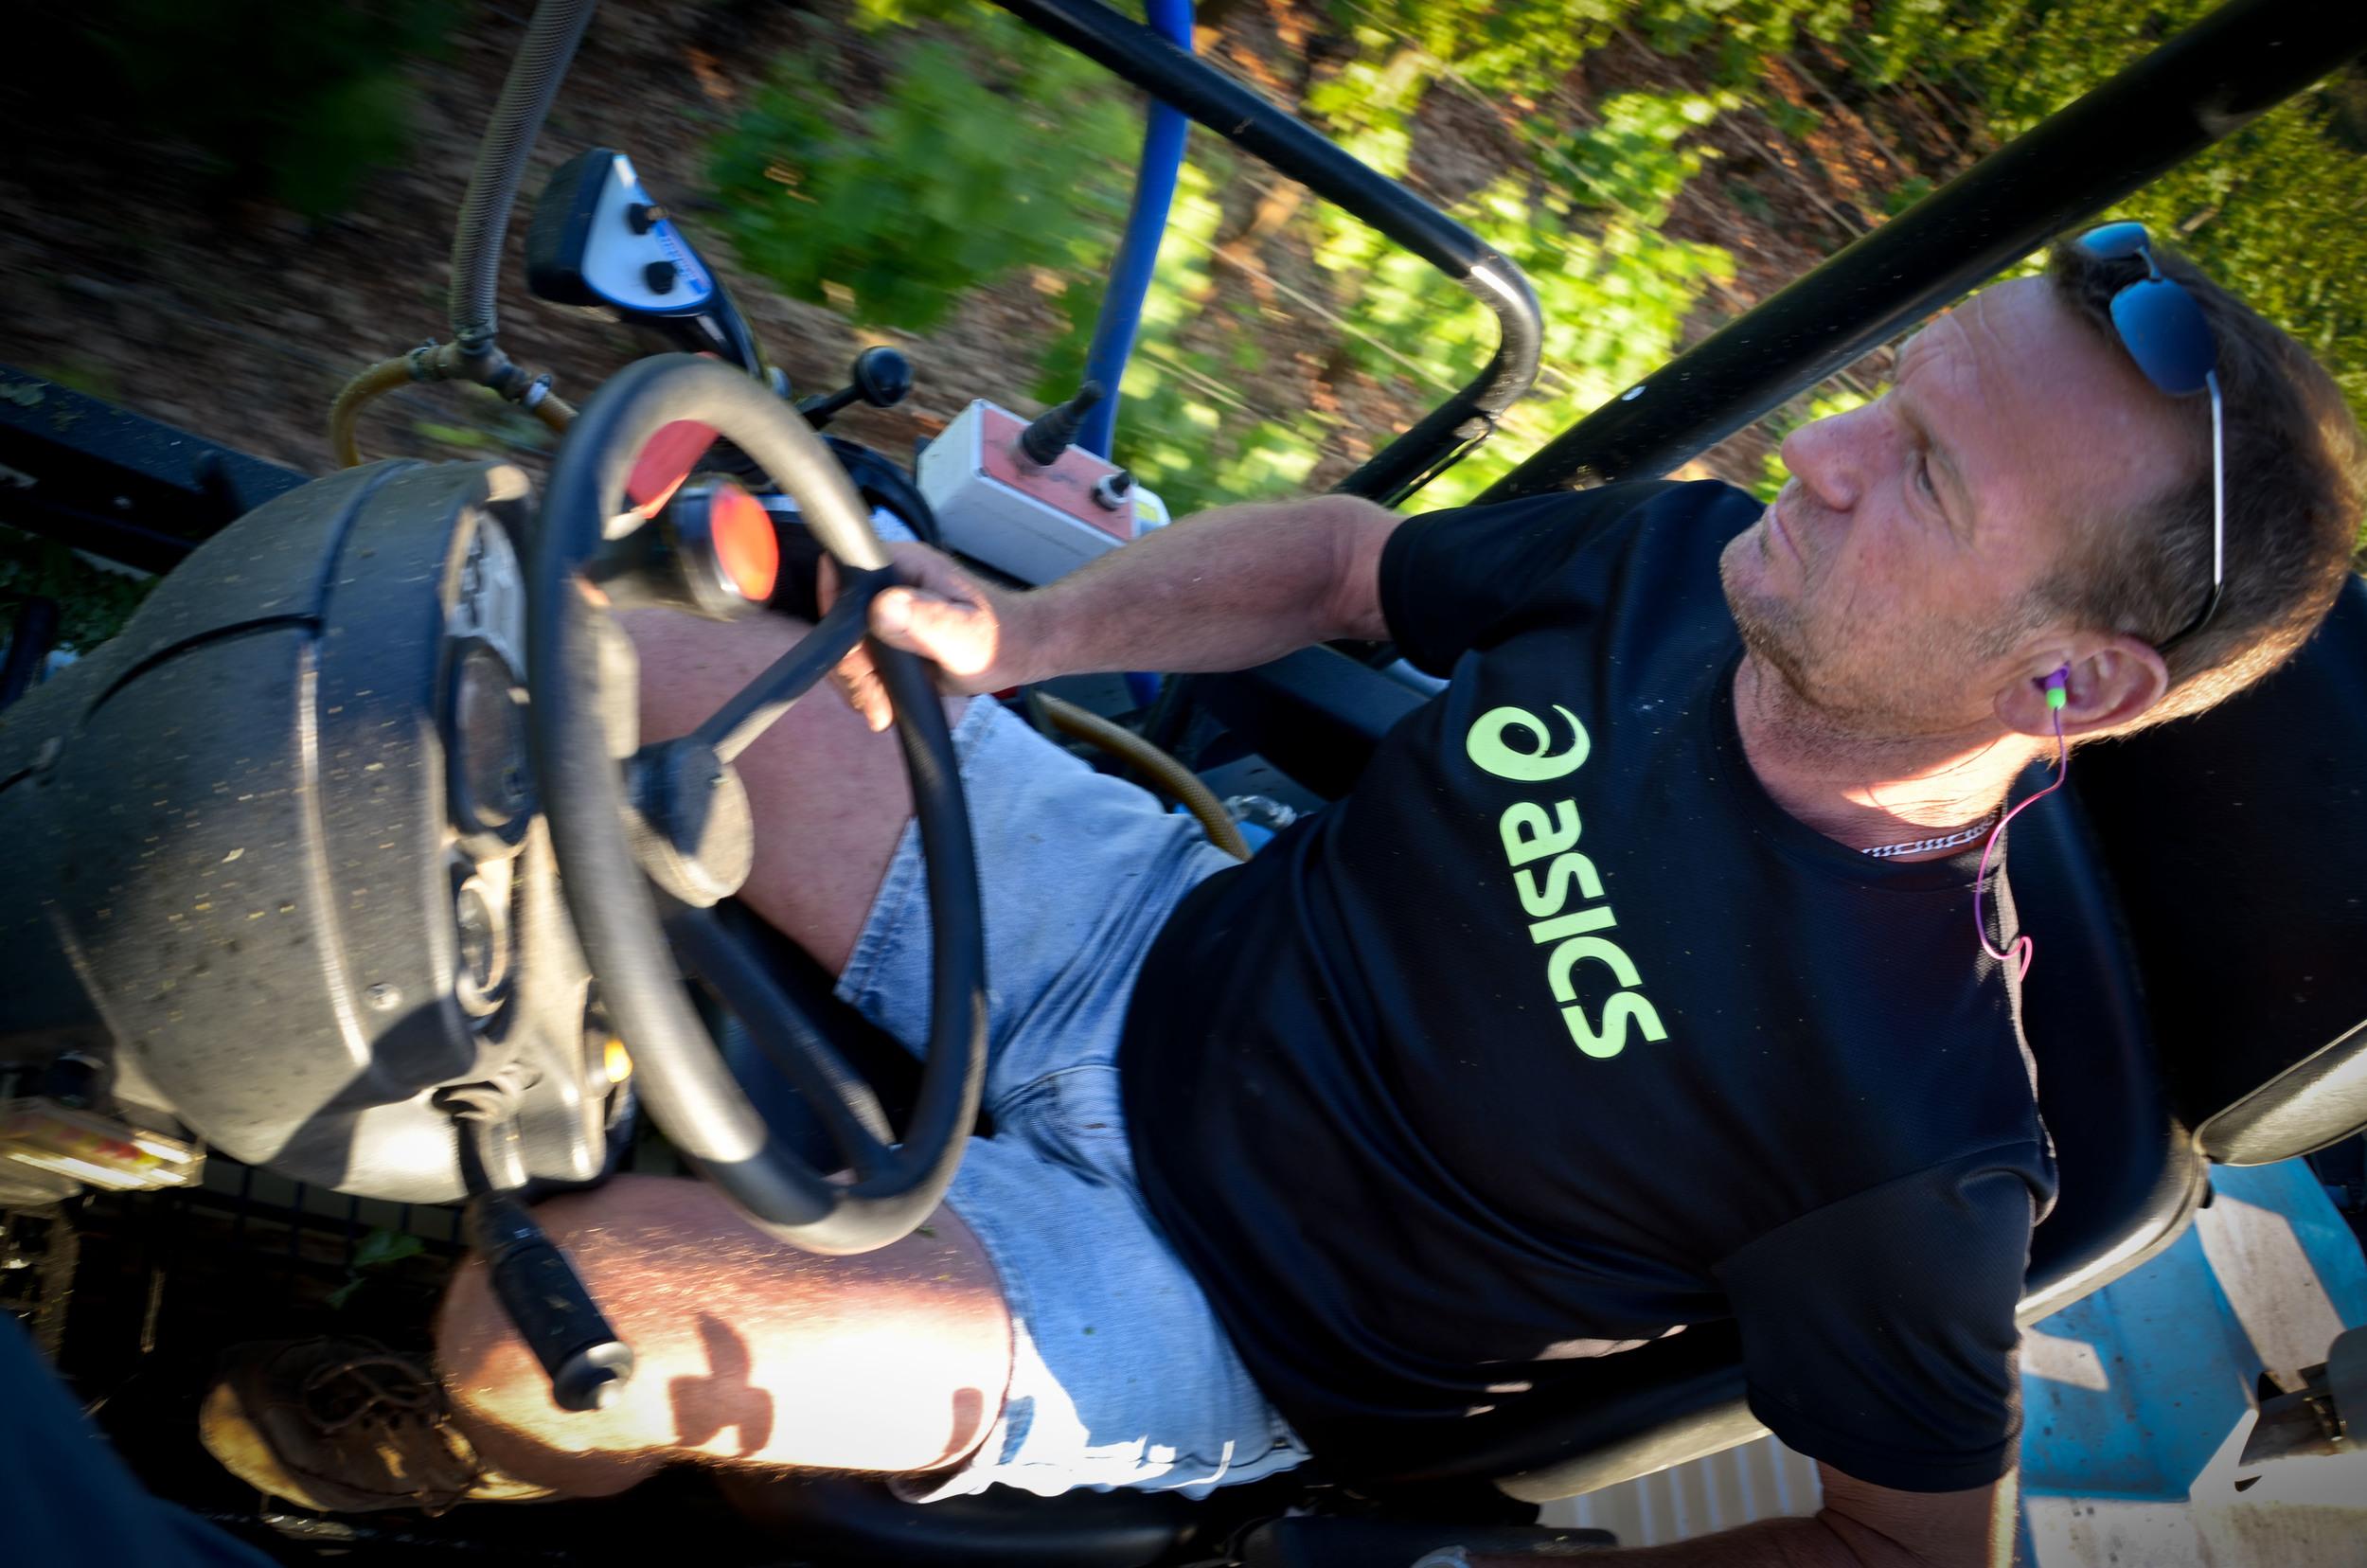 hungrycyclist_2014_june-27.jpg